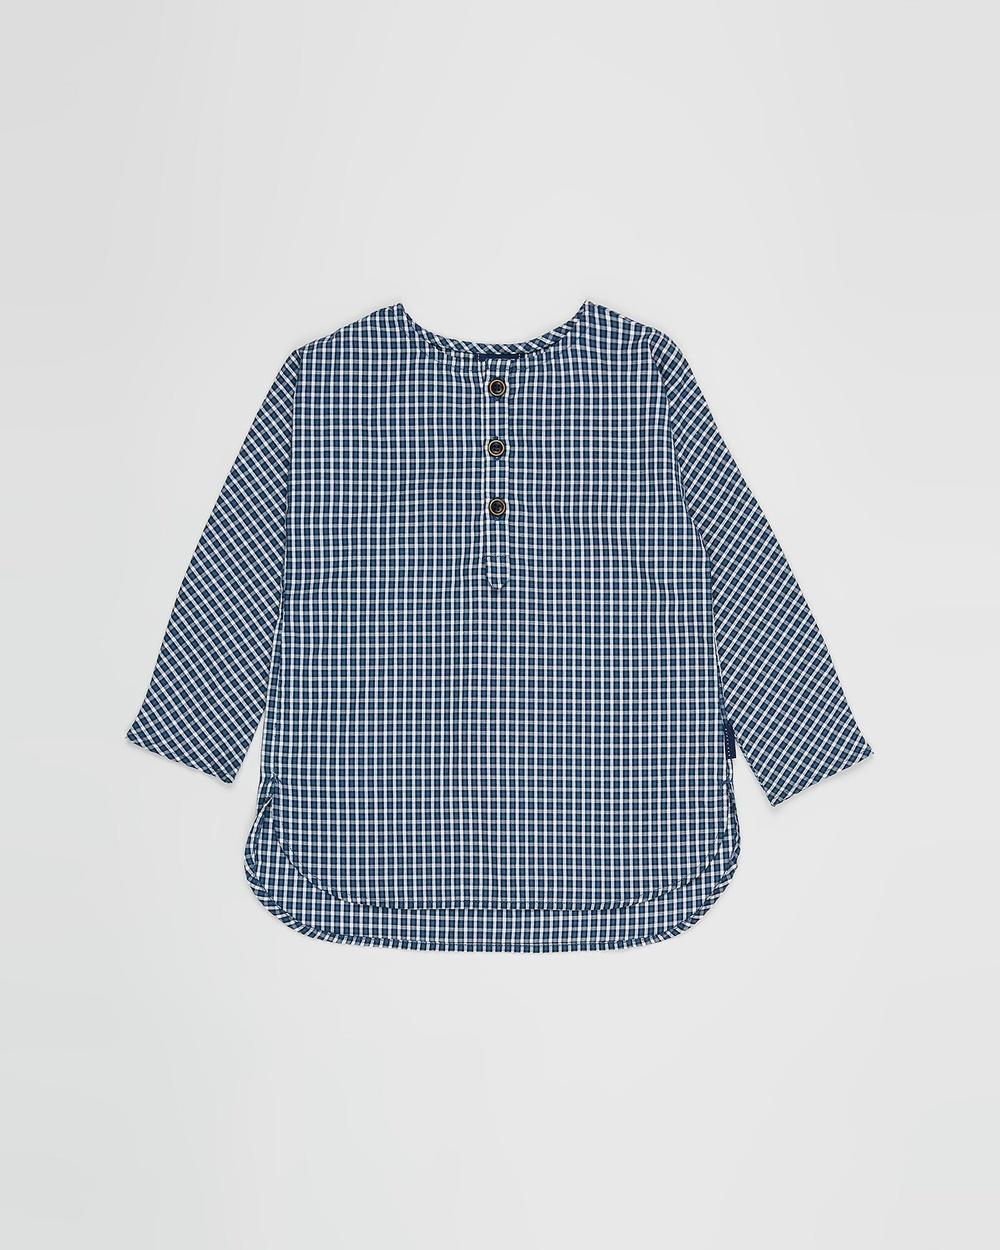 Pappe Prairie Plaid Shirt Babies Kids Shirts & Polos Navy White Check Babies-Kids Australia